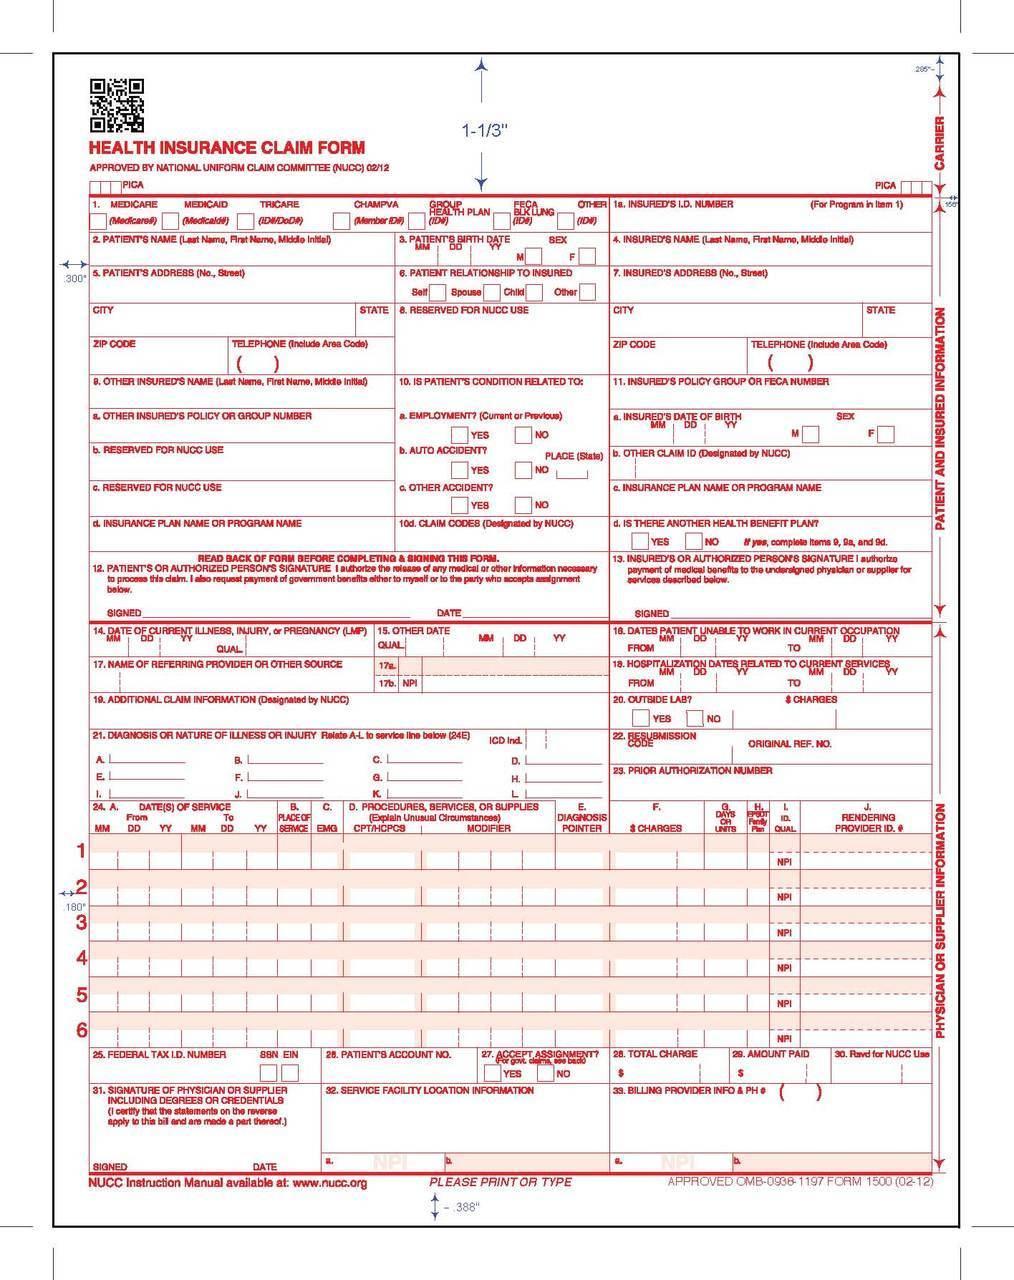 Hcfa 1500 Claim Form Diagnosis Codes